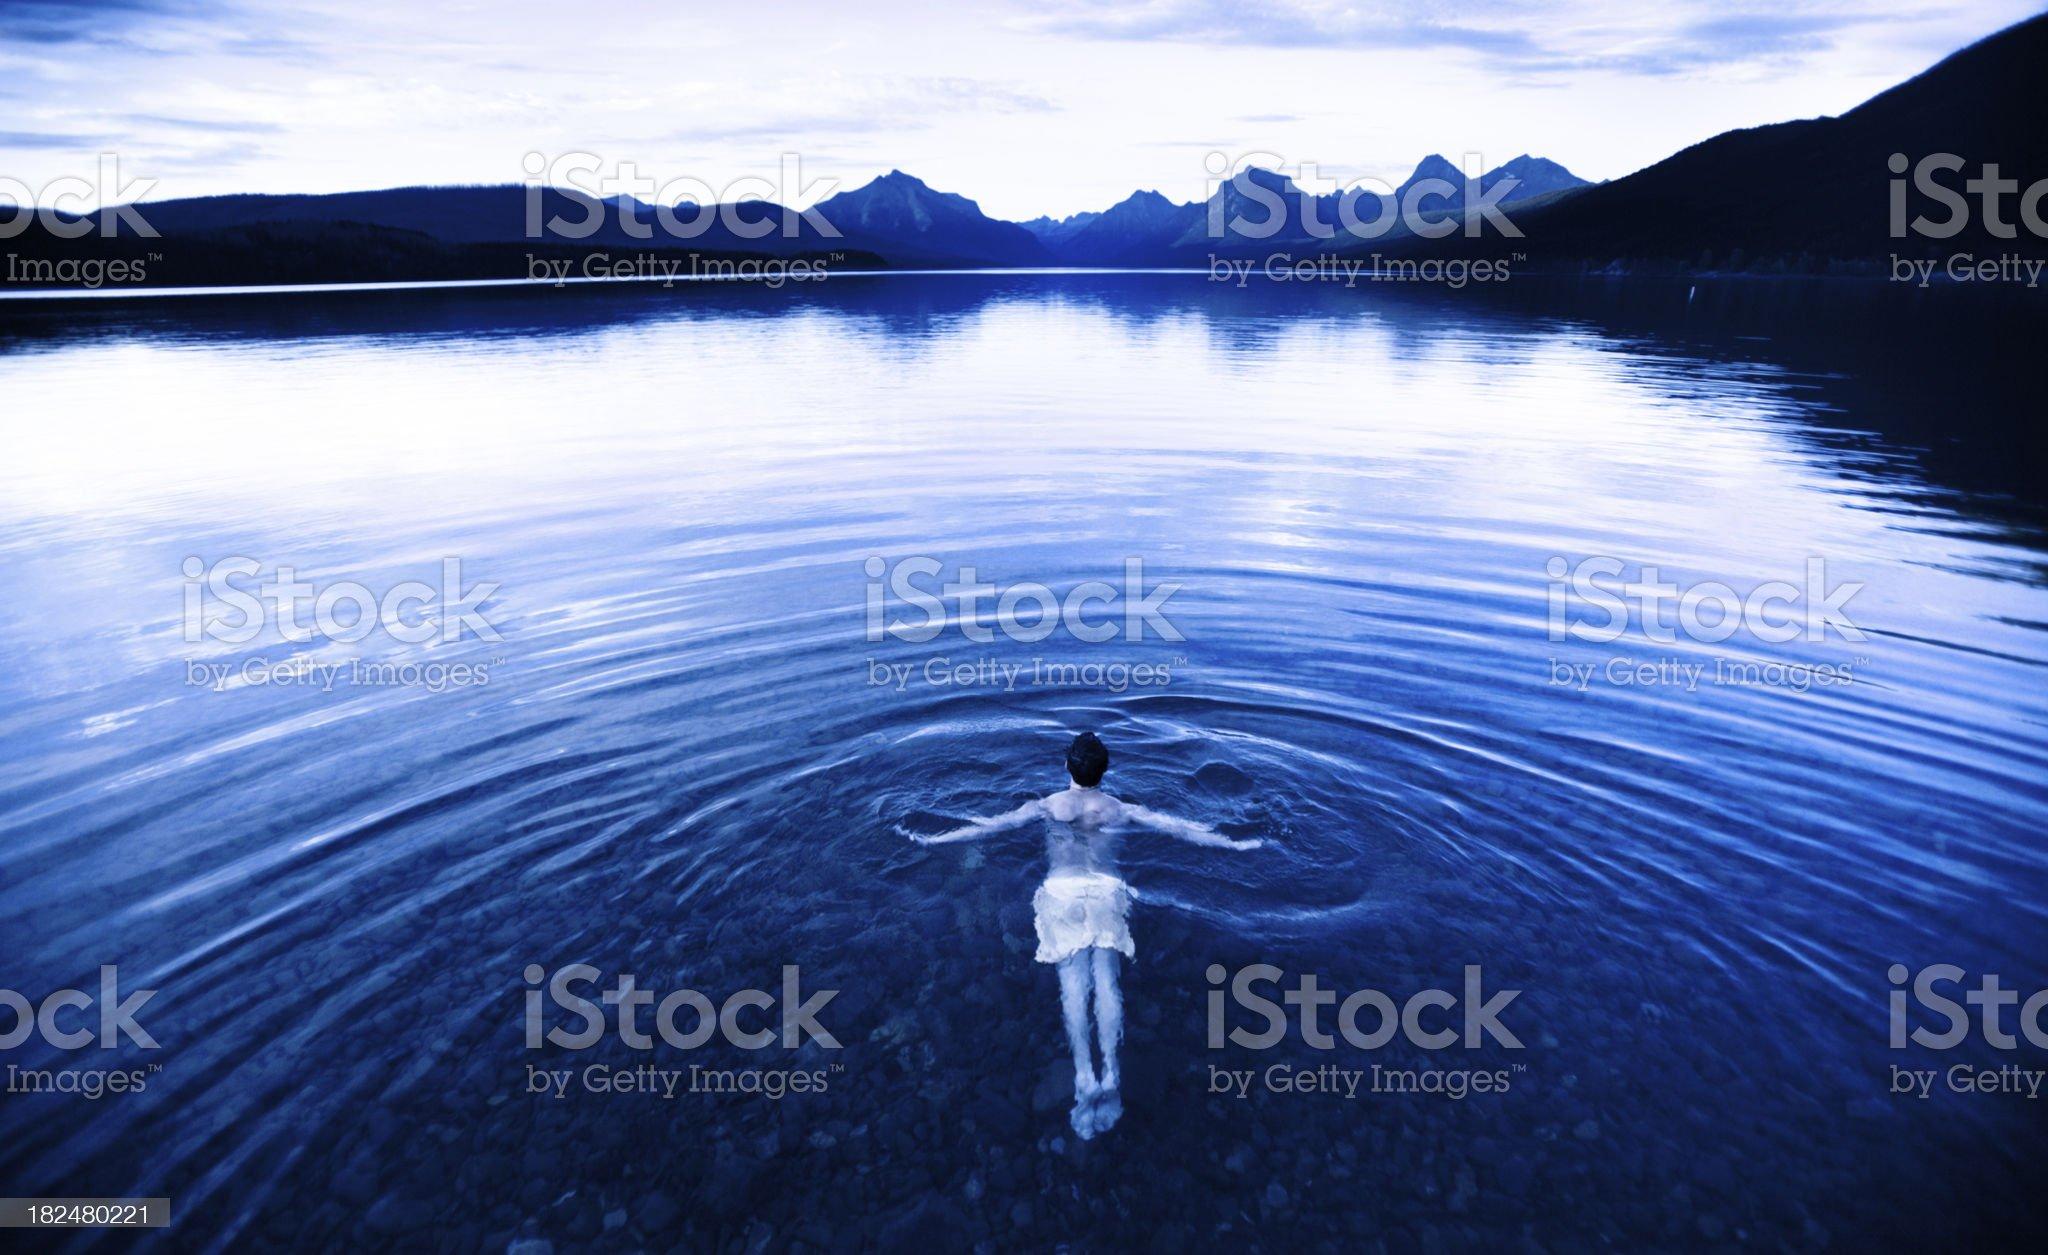 Swimming alone in a pristine mountain lake, Montana royalty-free stock photo